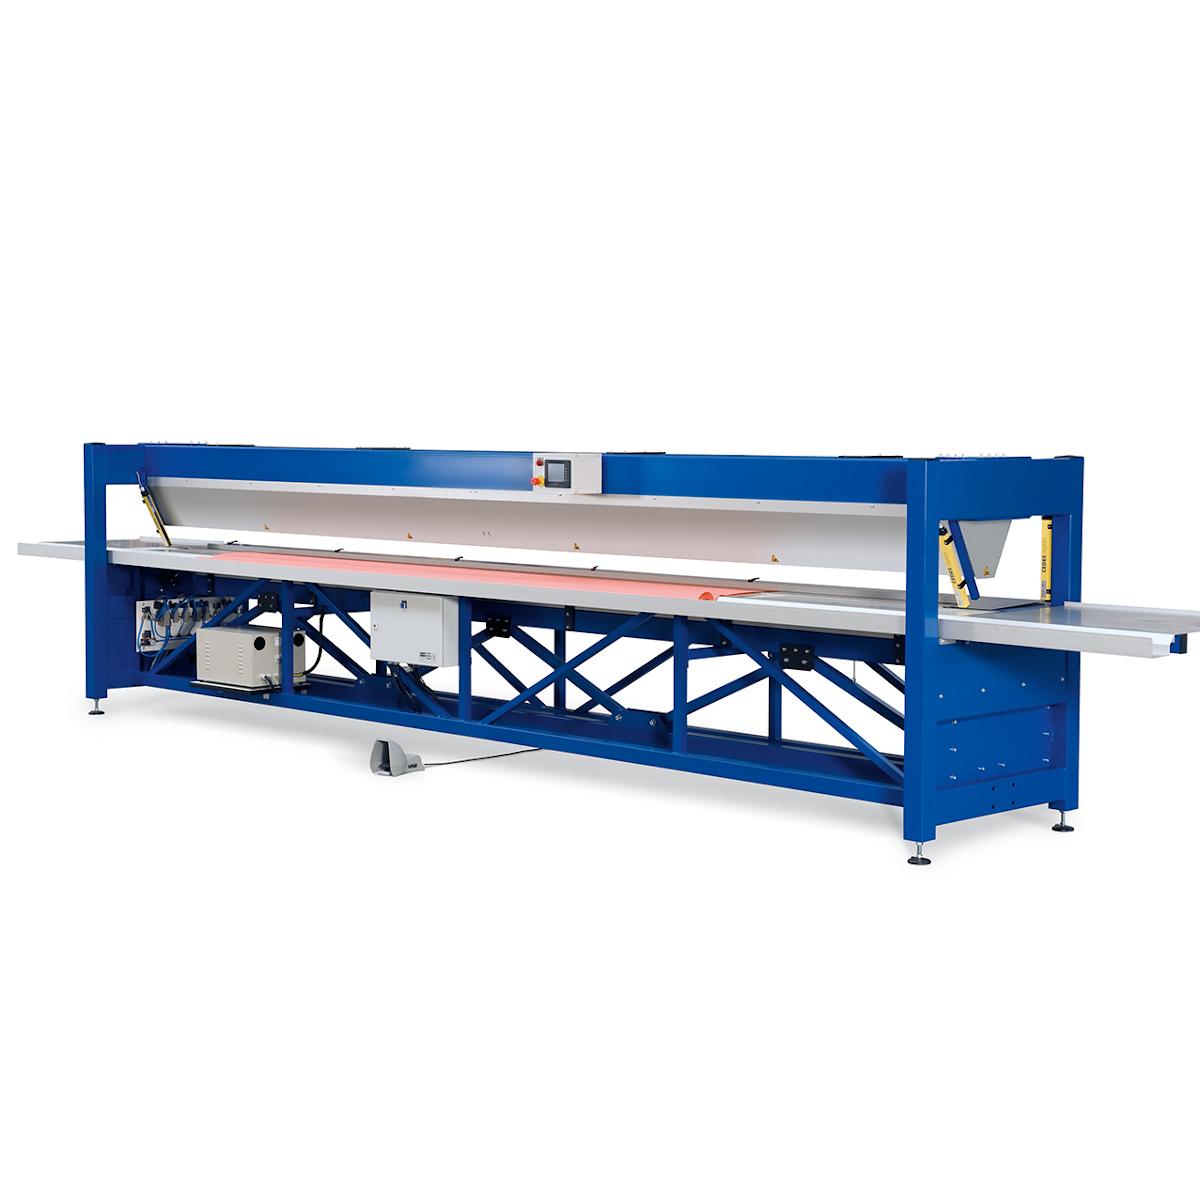 IL315/350/430/580/730 Folding & Welding Machines